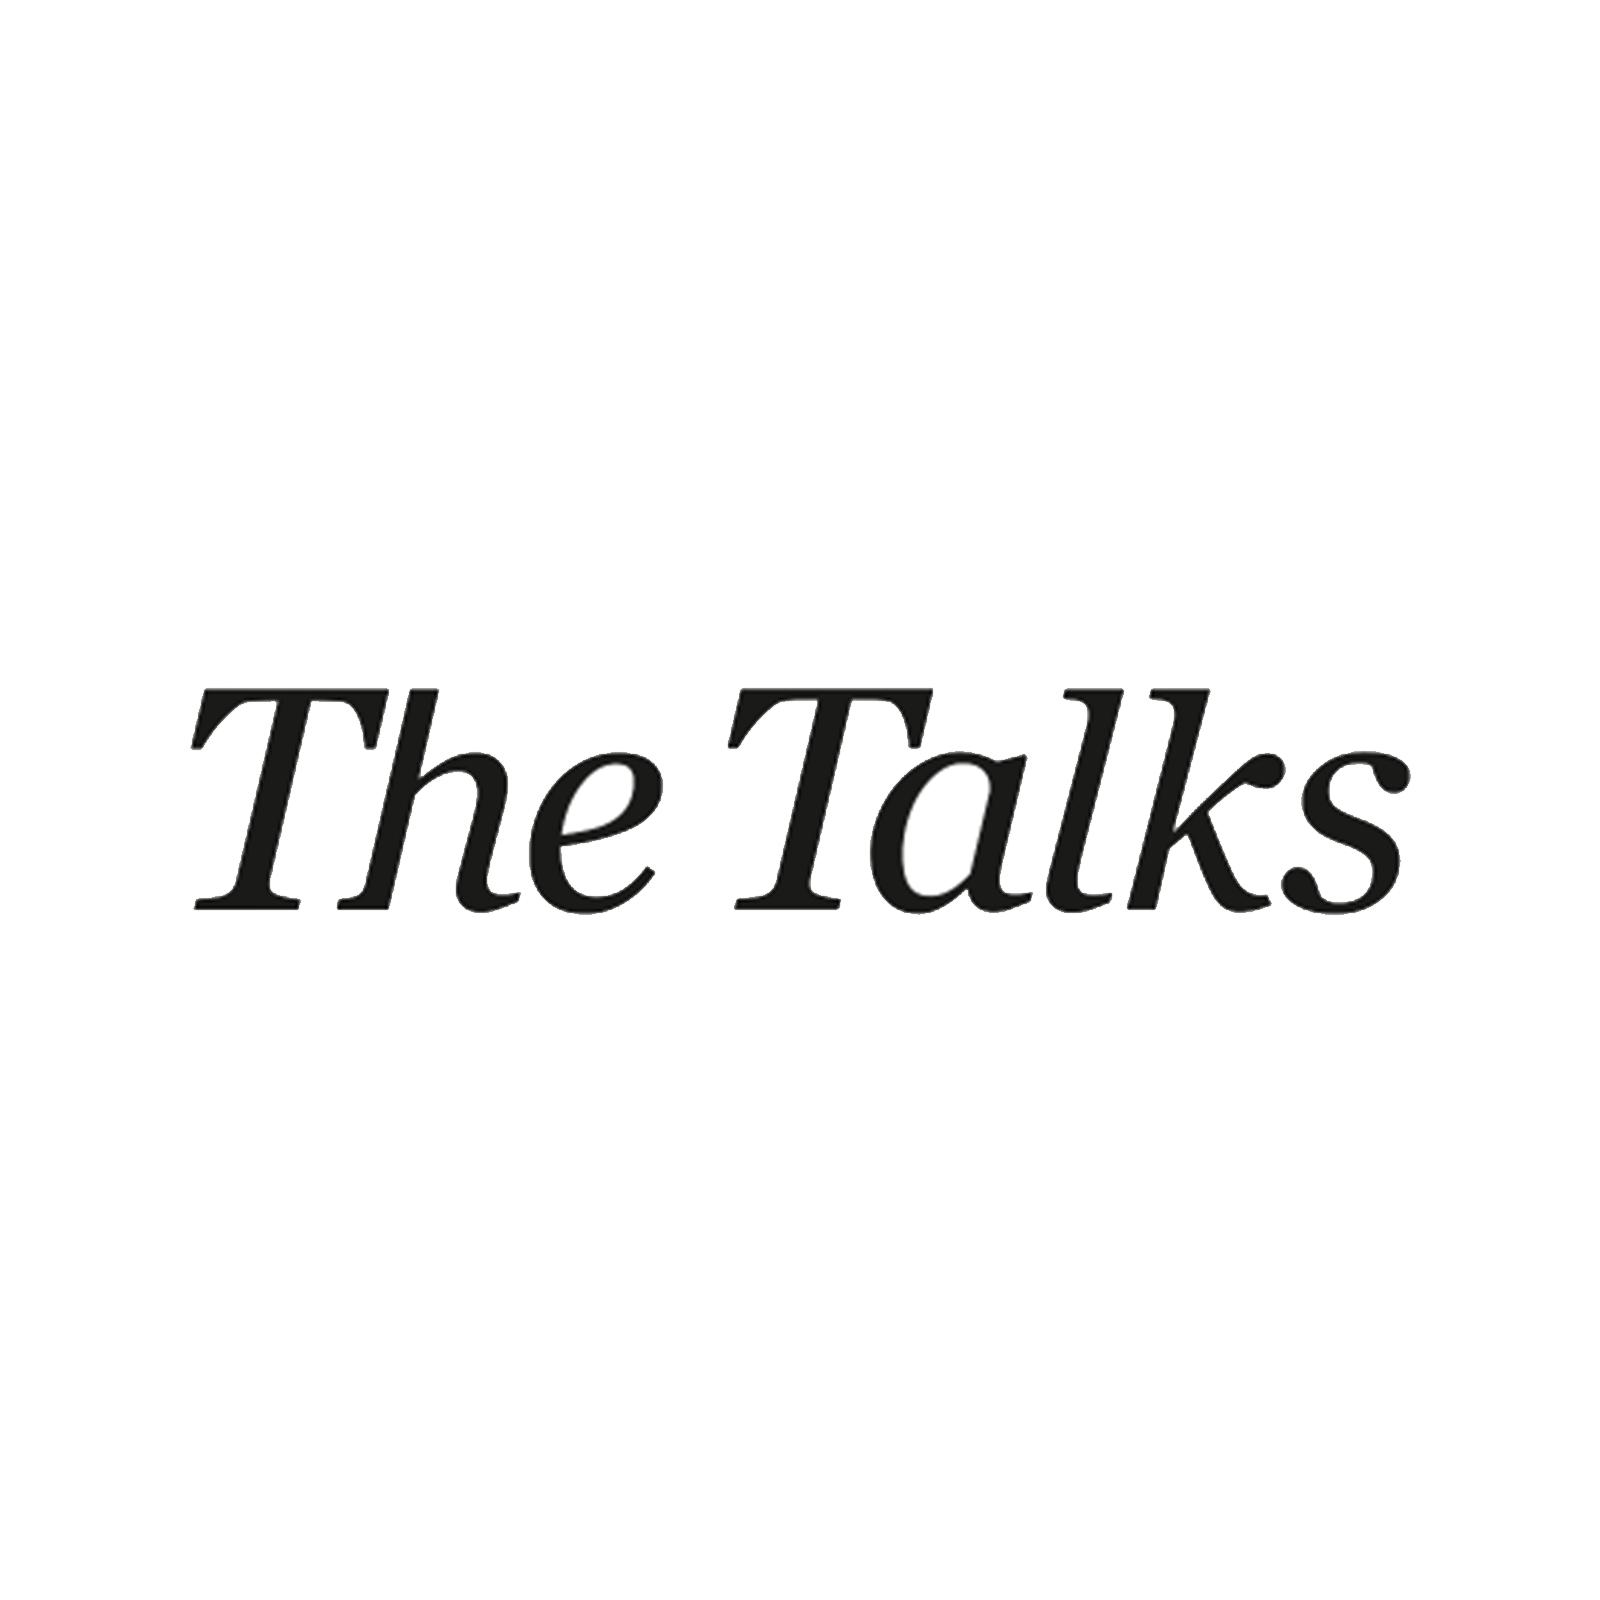 The Talks logo